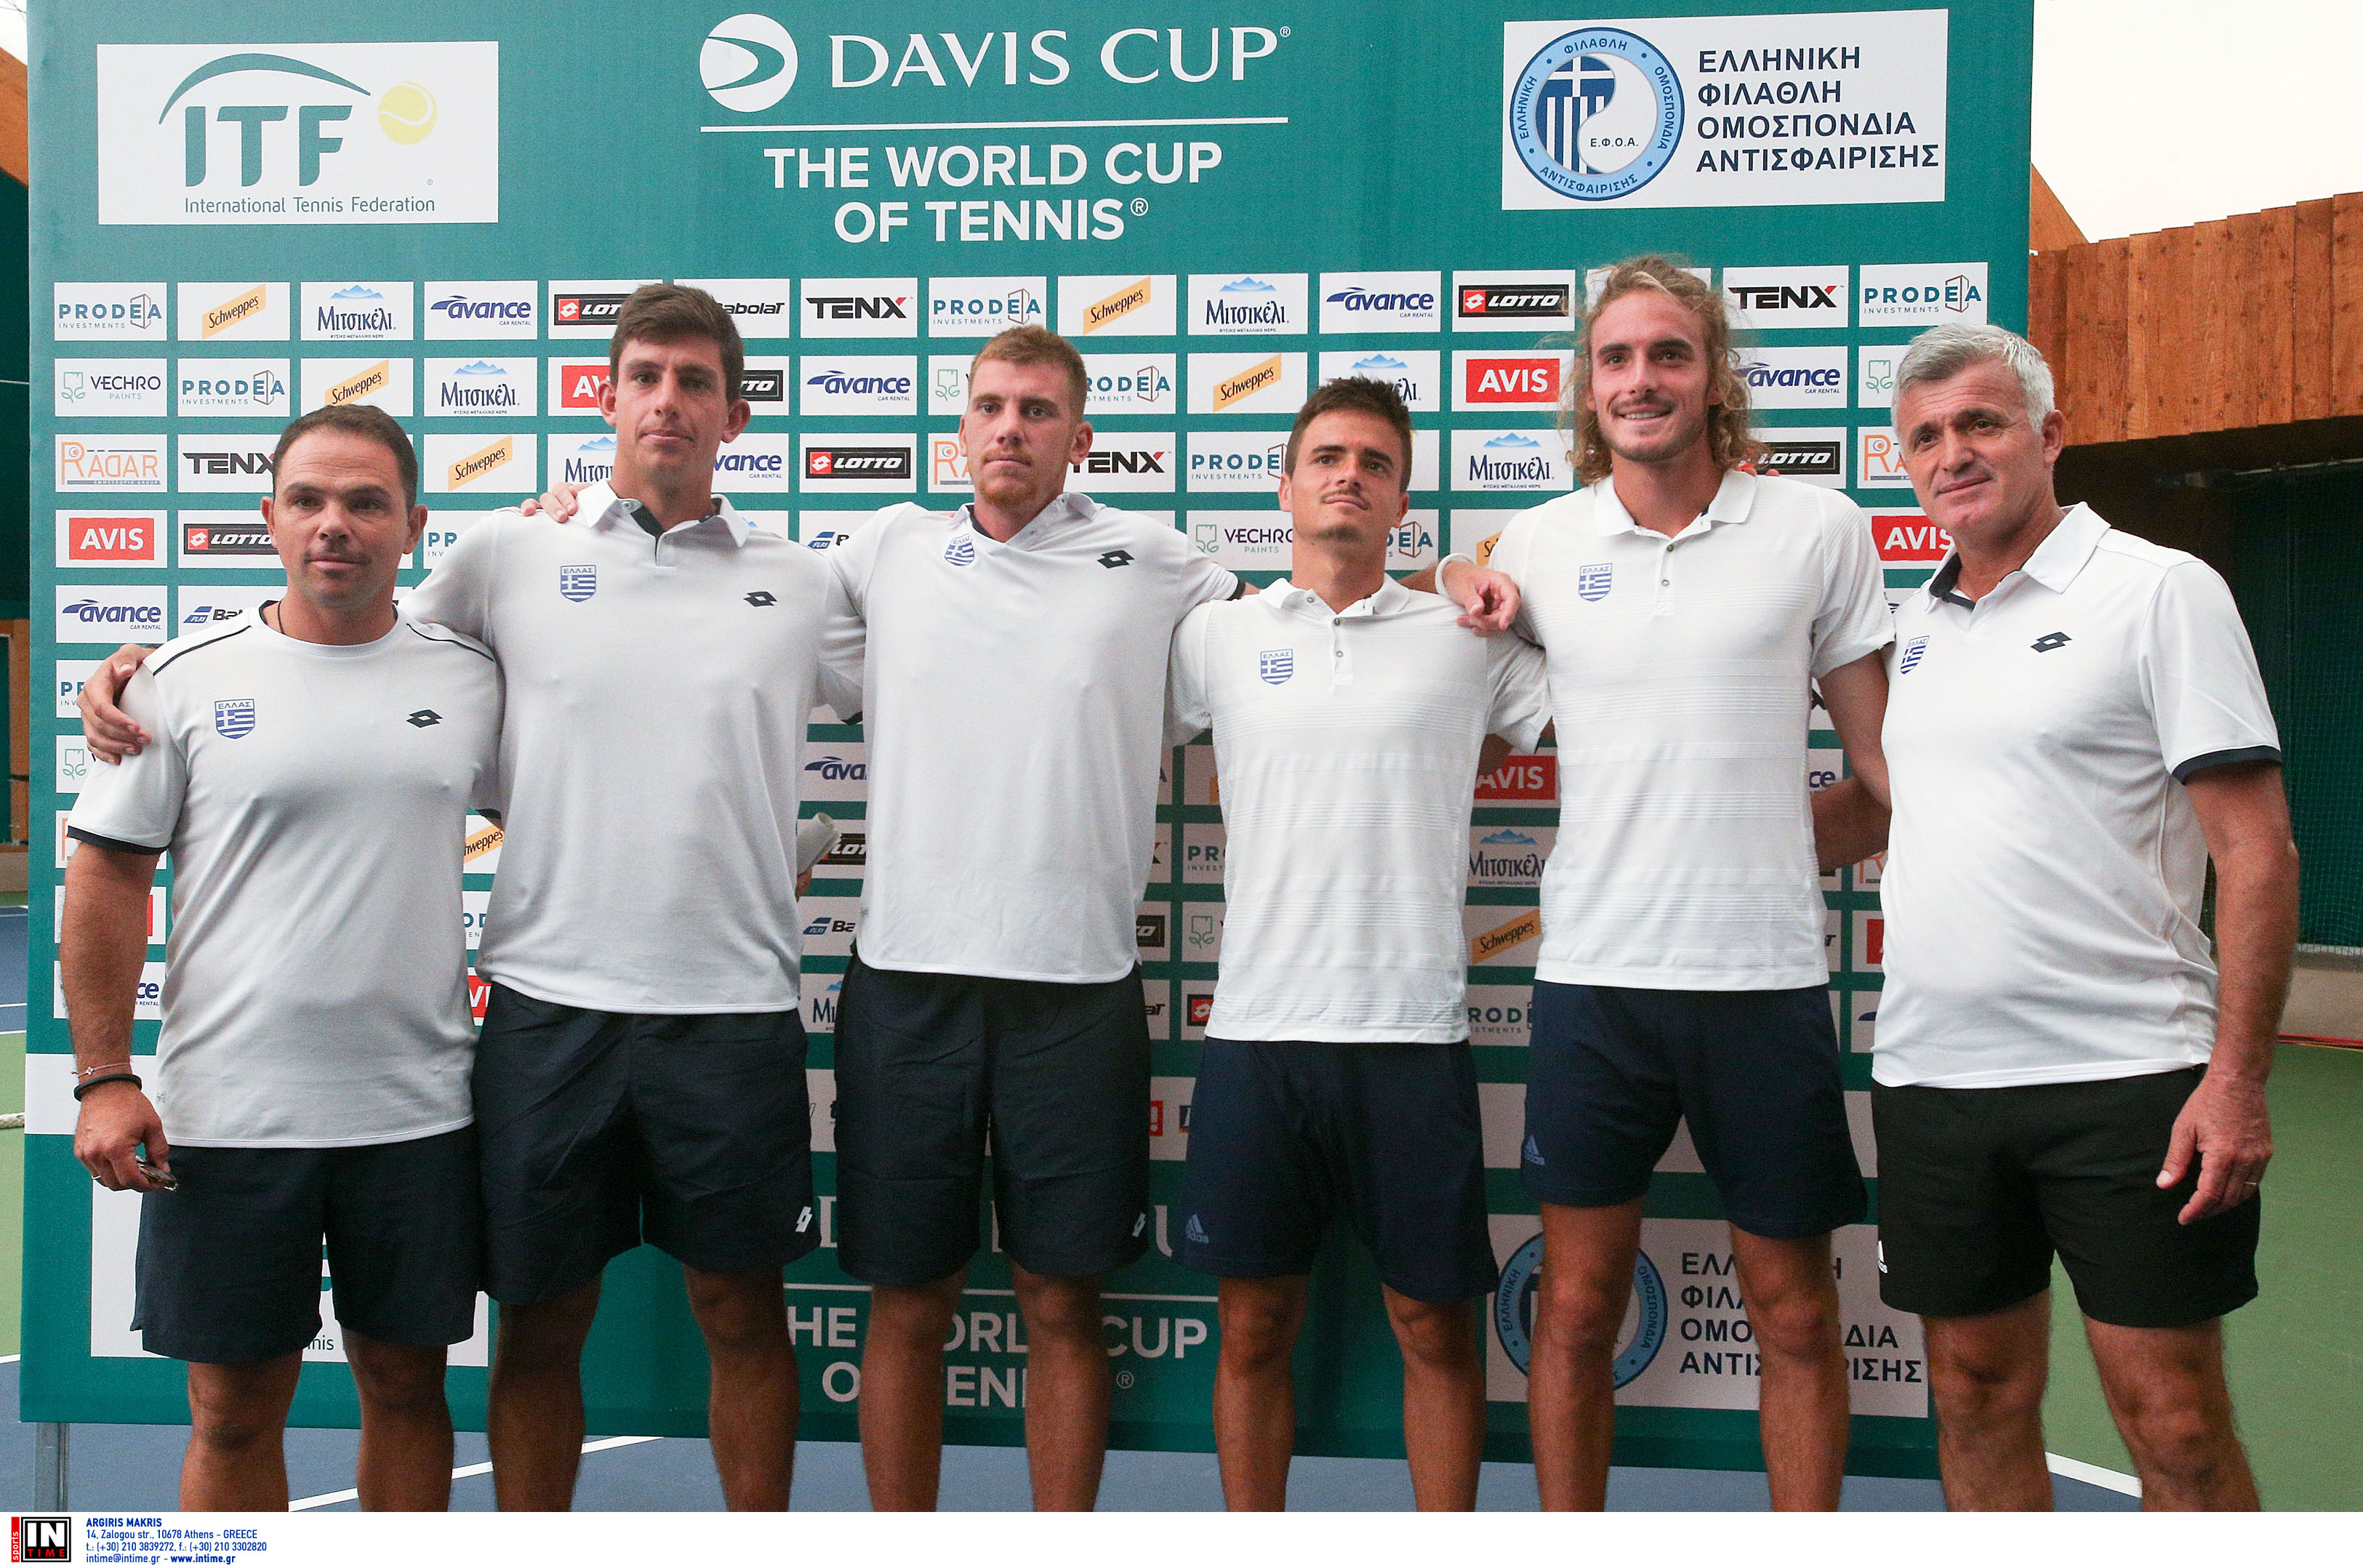 Davis Cup: Live Streaming η προσπάθεια της Εθνικής Ελλάδας και το ντεμπούτο του Στέφανου Τσιτσιπά